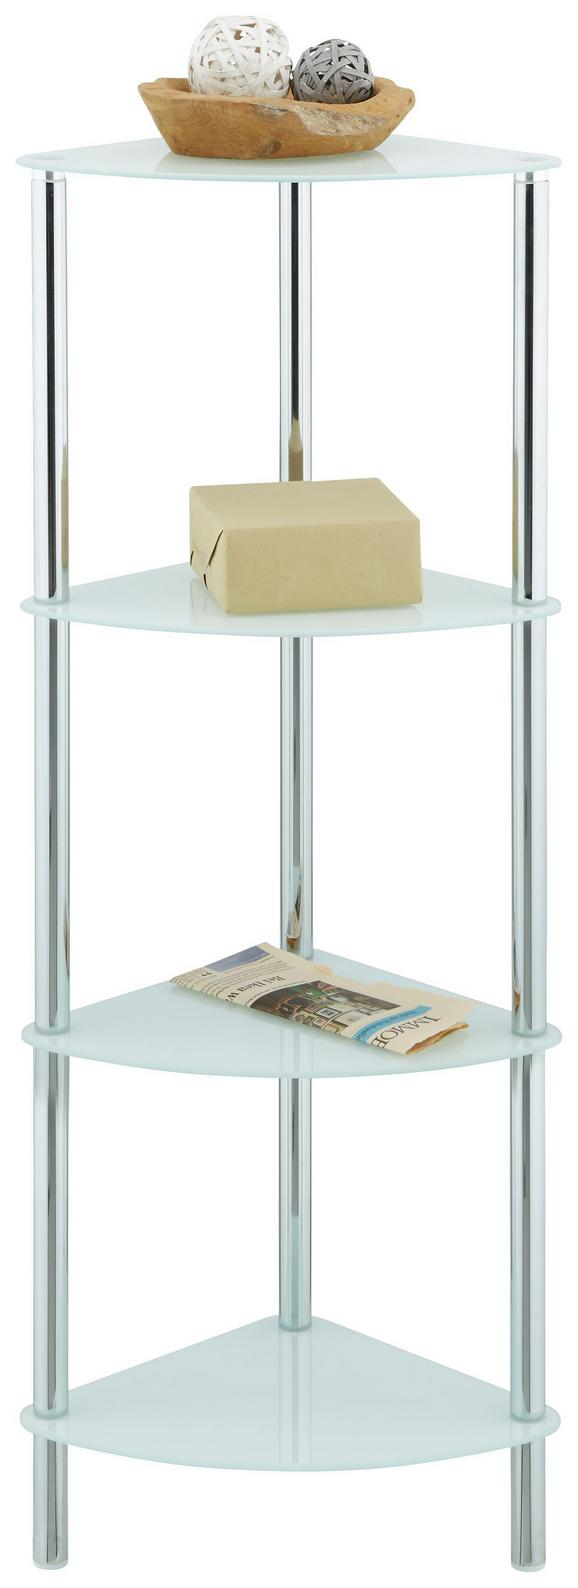 Regal in Weiß - Chromfarben/Weiß, MODERN, Glas/Metall (29/100/29cm) - MÖMAX modern living